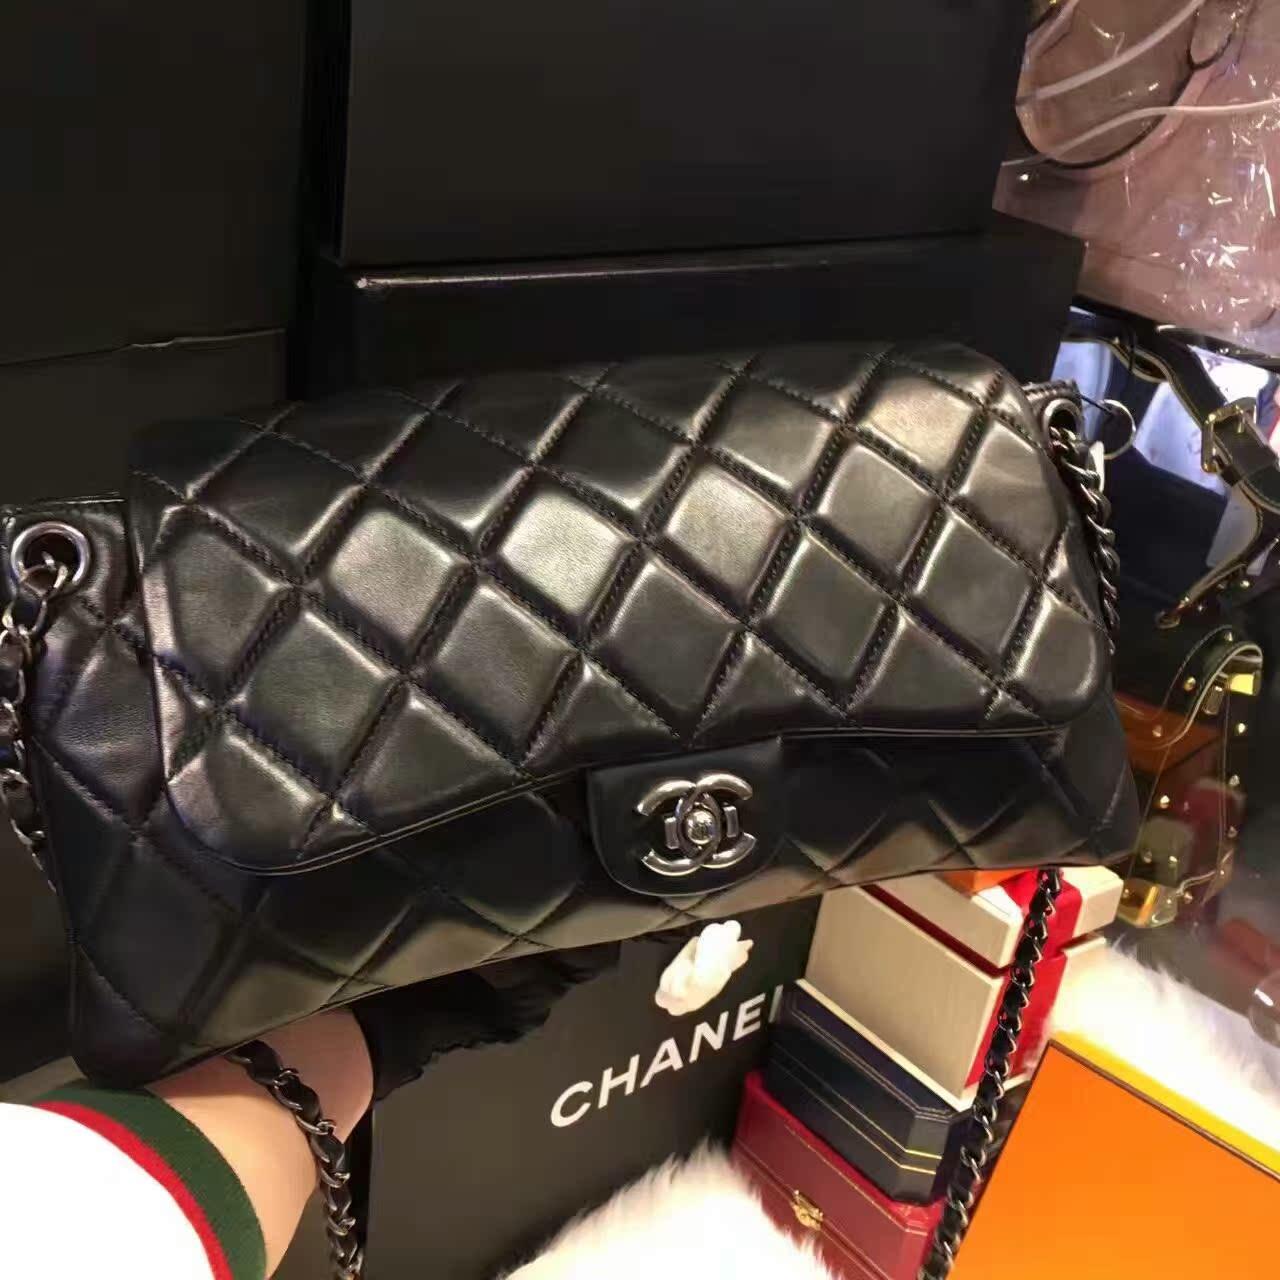 chanel链条包 Chanel黑色牛皮黑金中号CF链条包奢侈品单肩包二手正品_推荐淘宝好看的chanel链条包